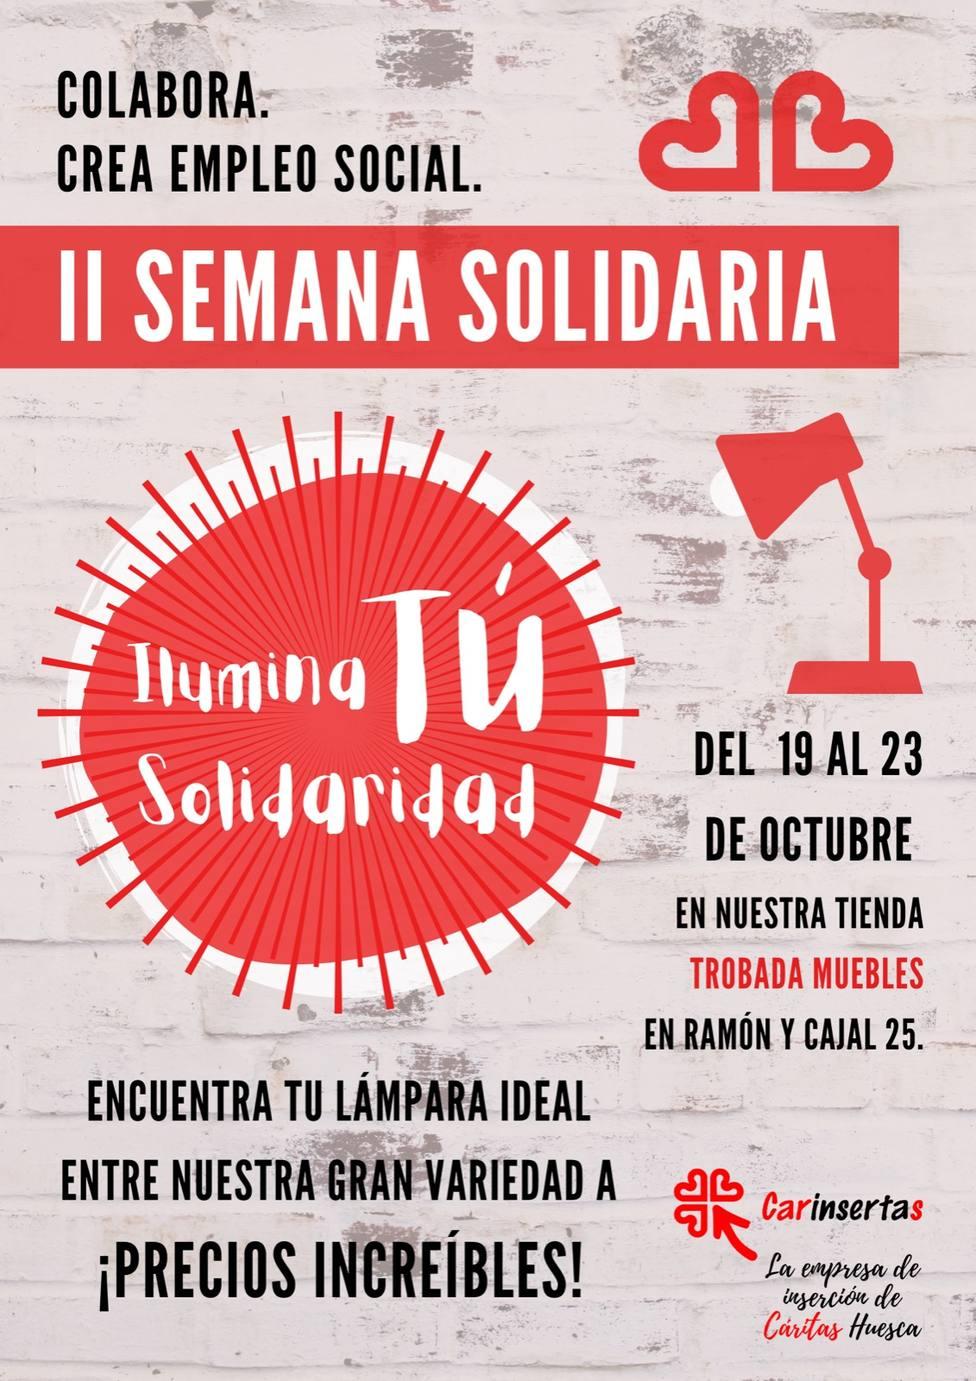 II Semana solidaria de Carinsertas